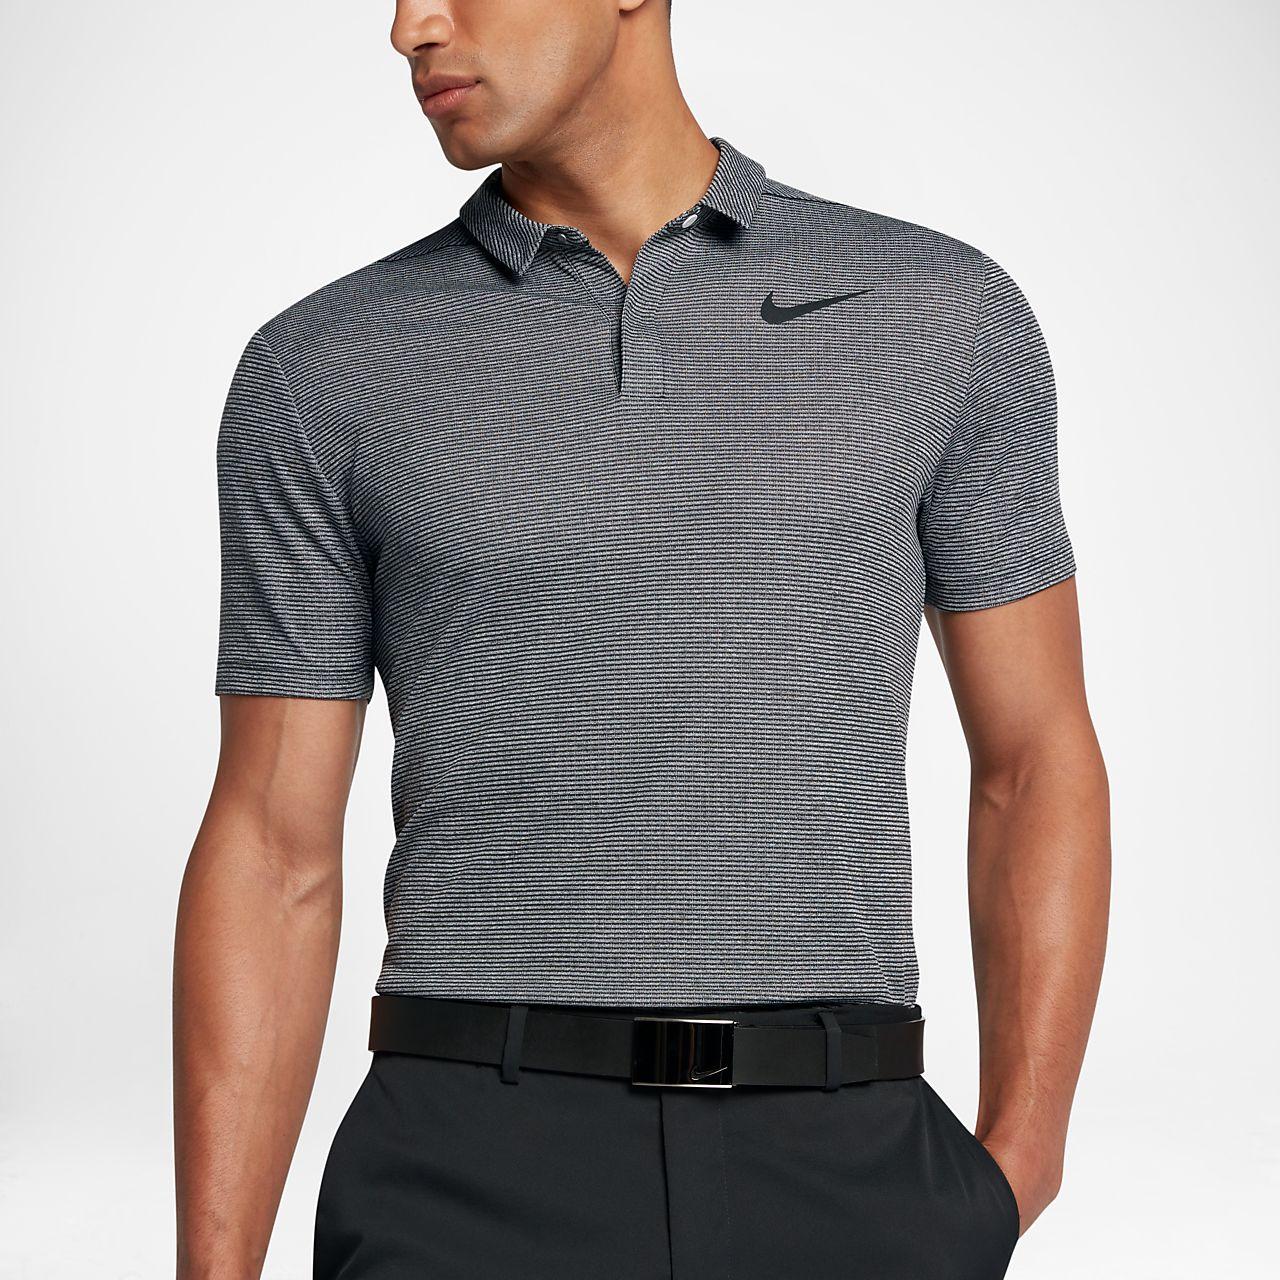 ... Nike AeroReact Men's Standard Fit Golf Polo